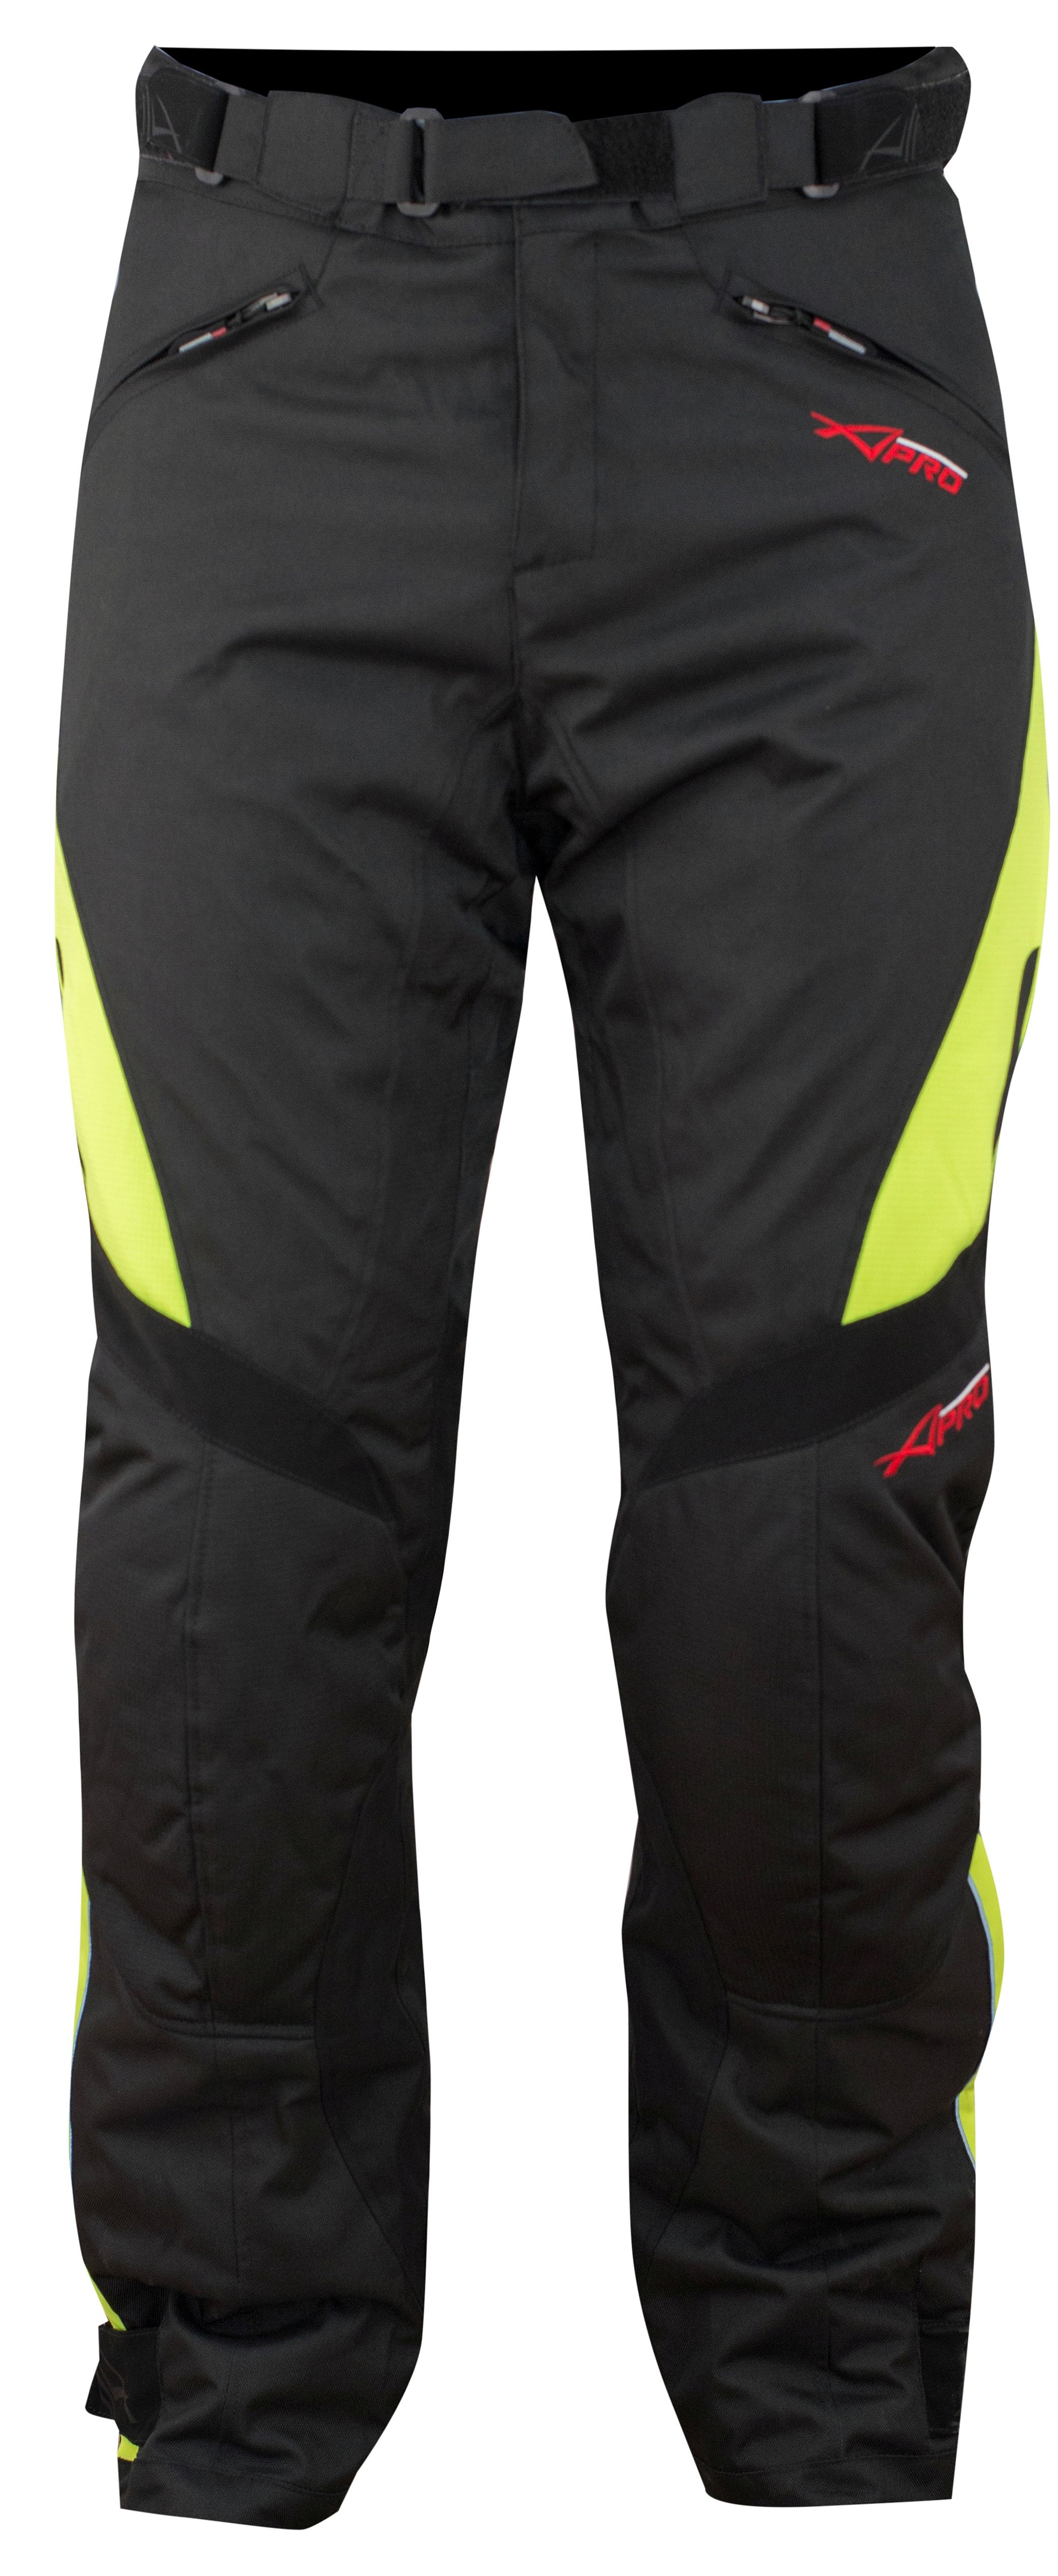 miniatuur 15 - Pantaloni Impermeabile Moto Imbottitura Termica Estraibile Traspirante Cordura